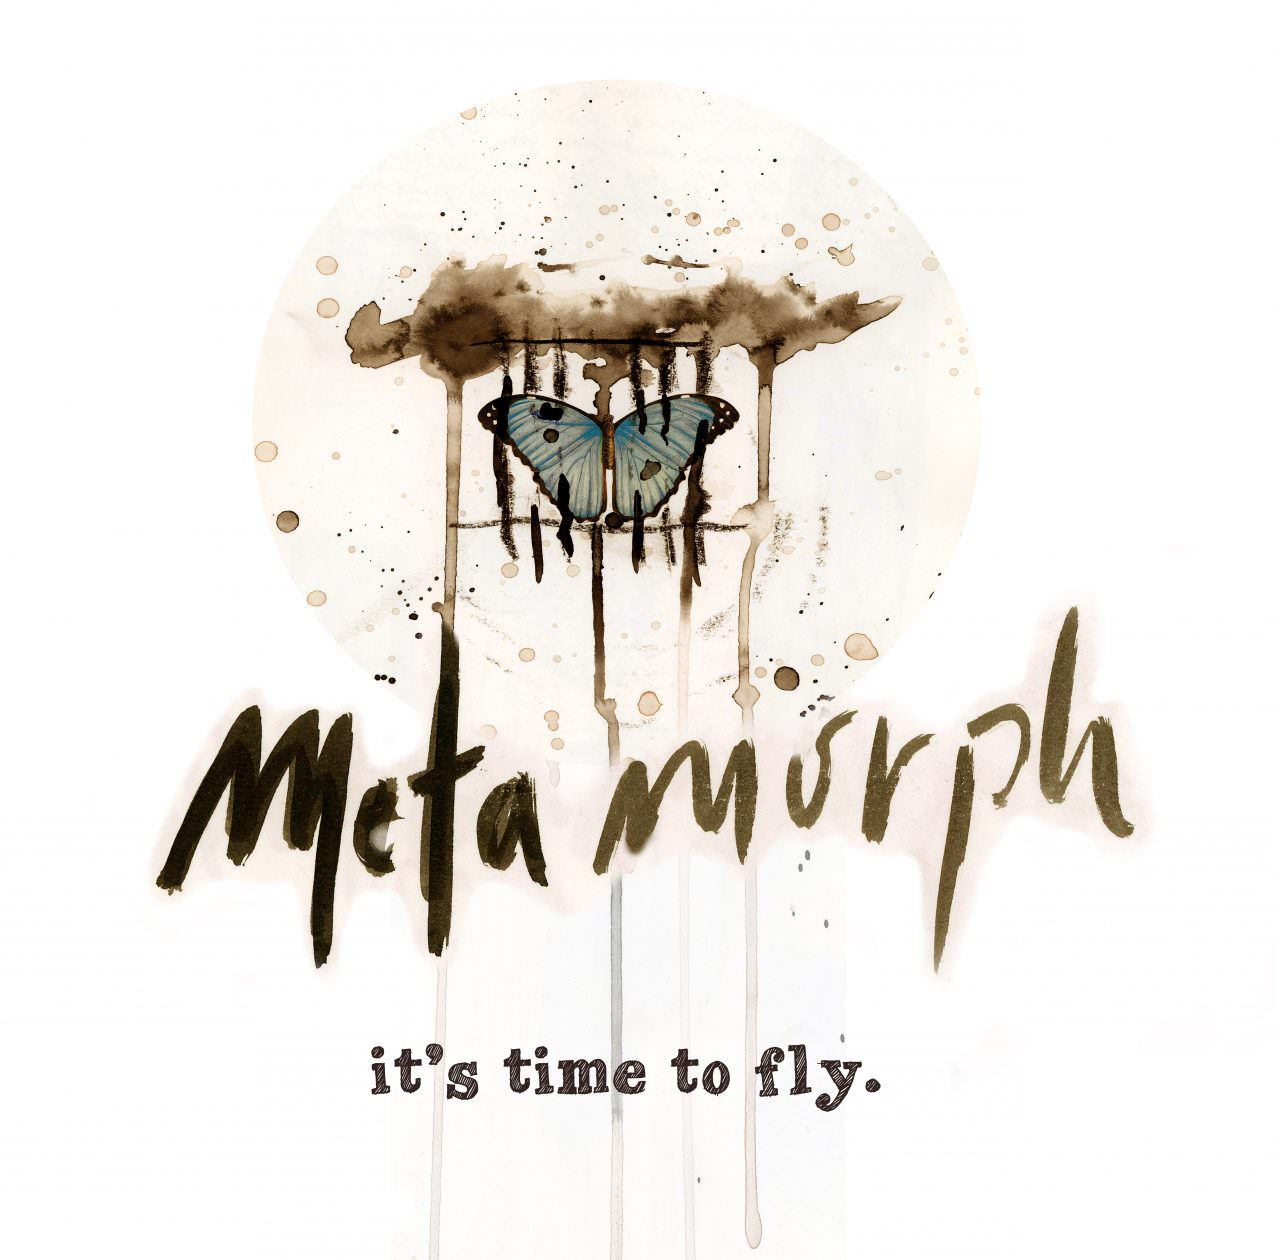 metamorph-time-to-fly-sm-1276x1260-2.jpg